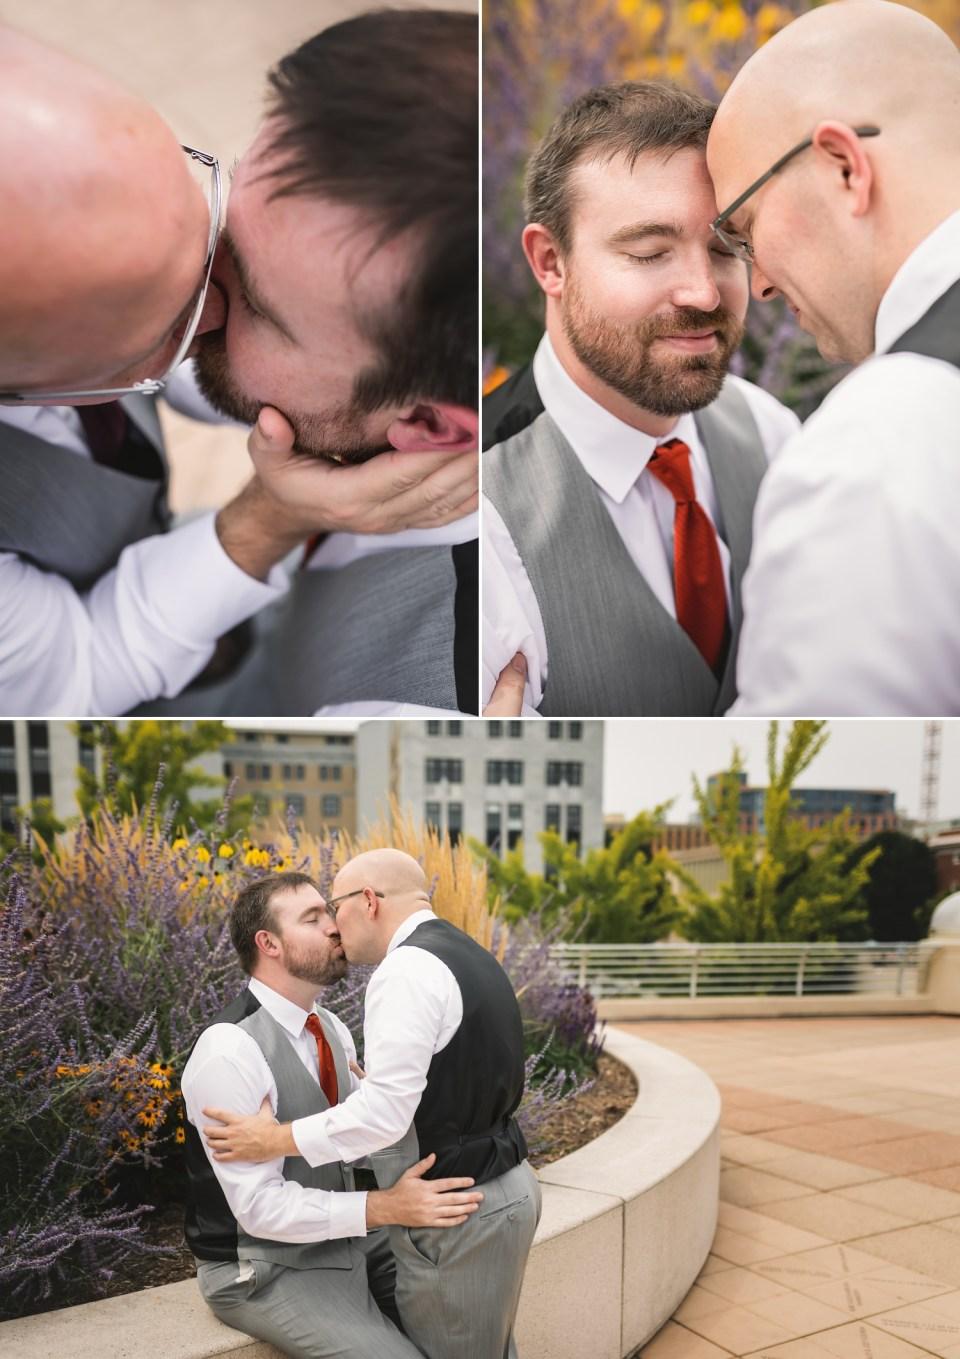 LGBTQ Wedding Photos | Pink Spruce Photography | www.pinksprucephotography.com